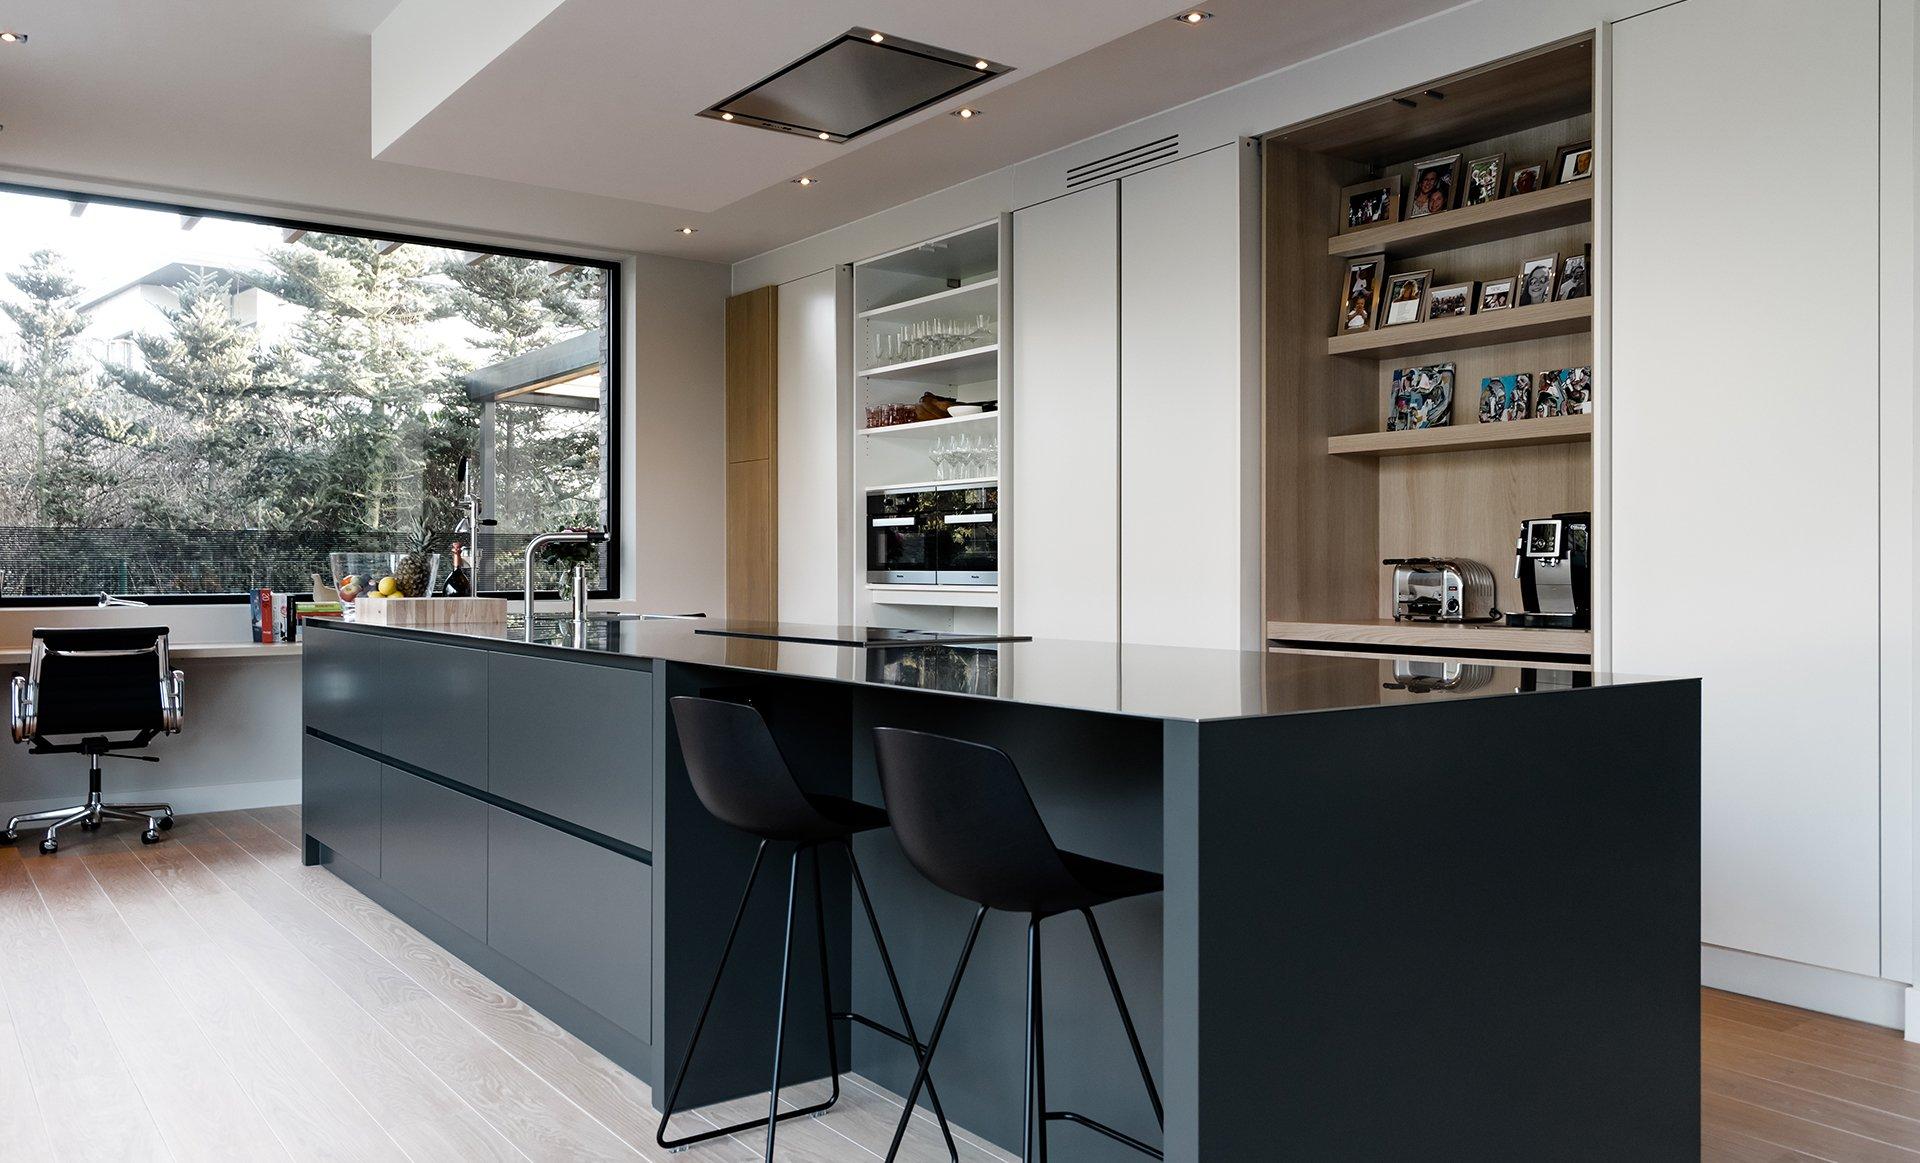 G design: keukens & interieur op maat.